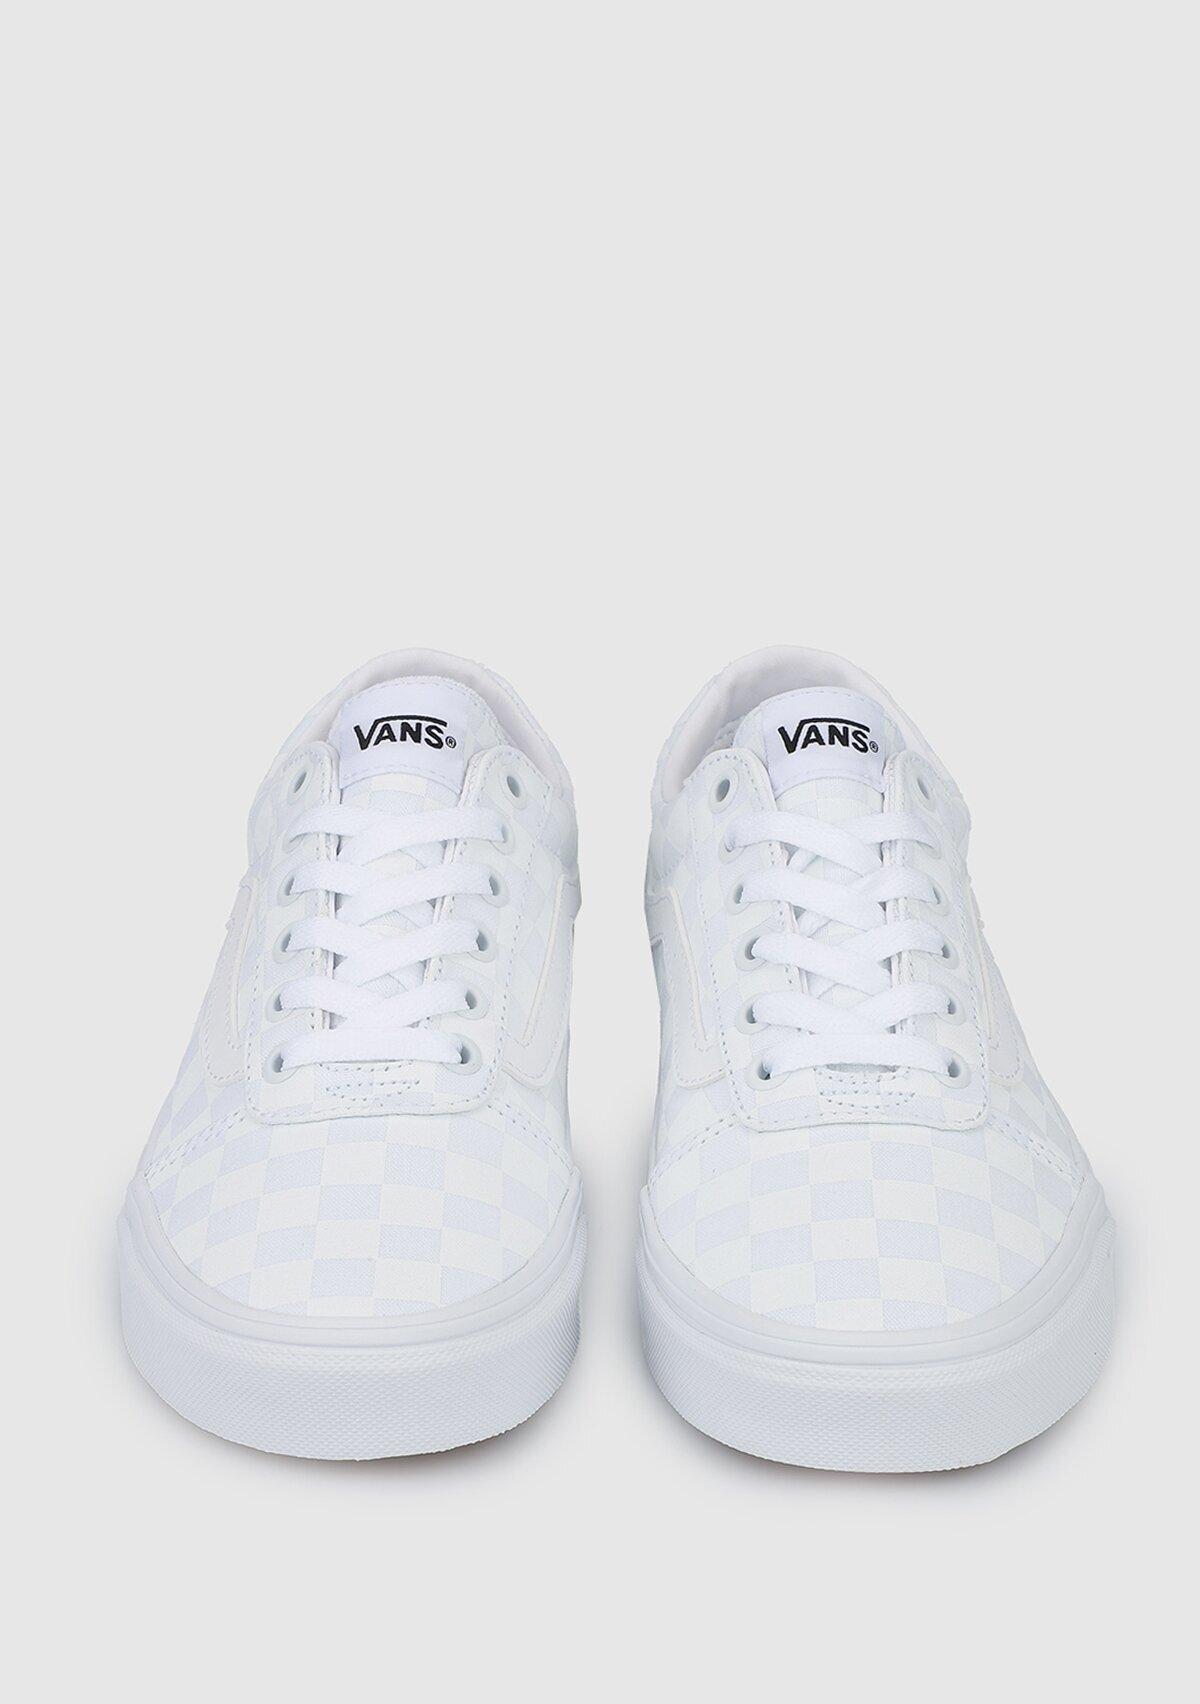 resm Checkerboard Beyaz  Ward Kadın Sneaker VN0A3IUNW511